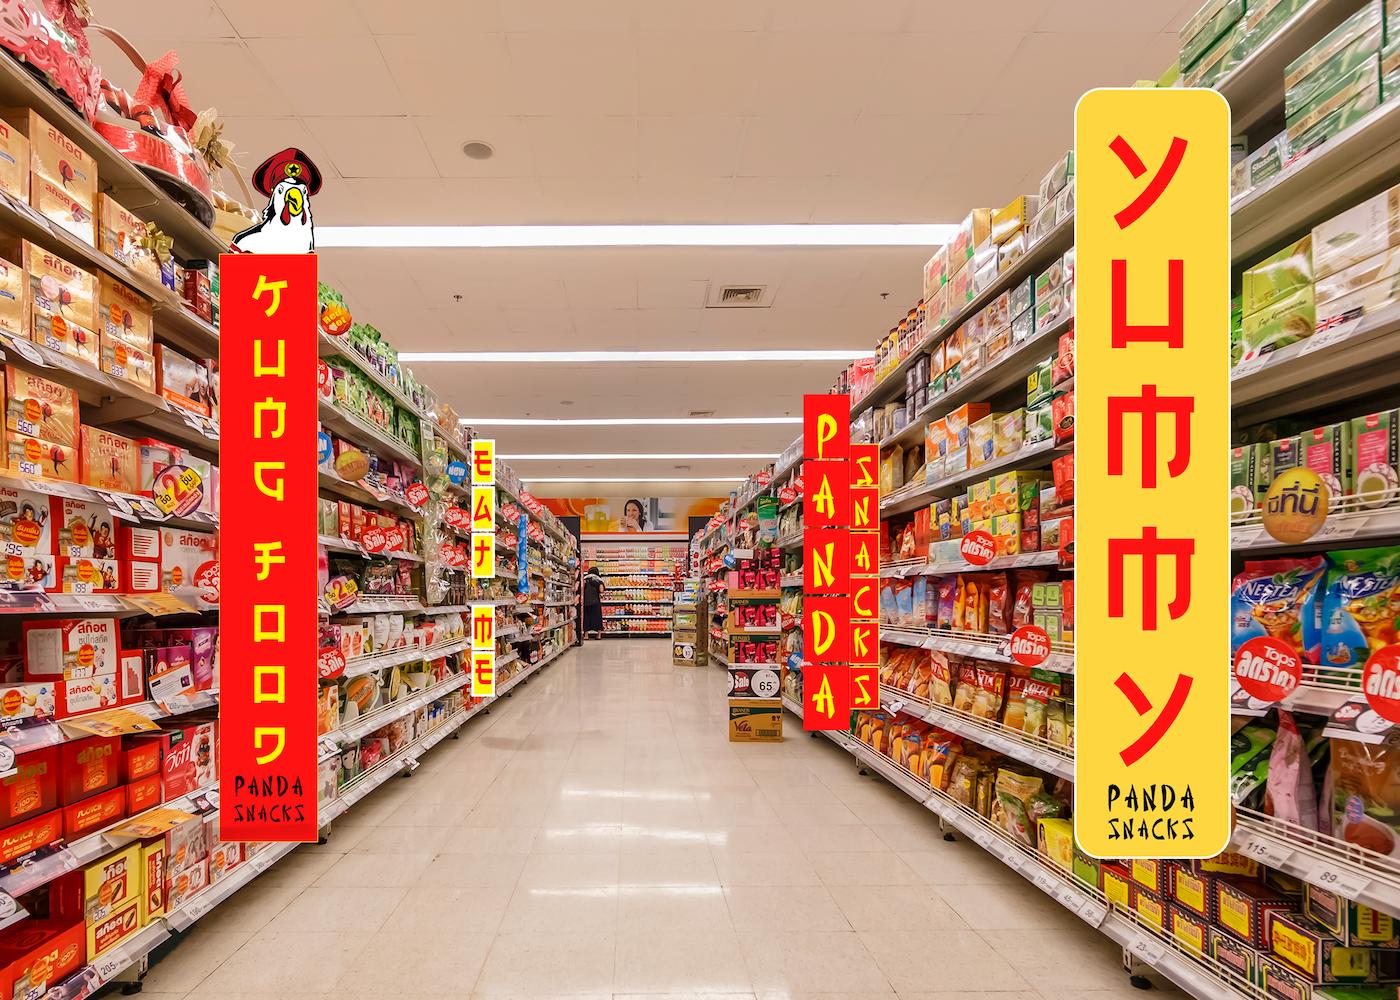 panda snacks  in-store supermarket 2.png